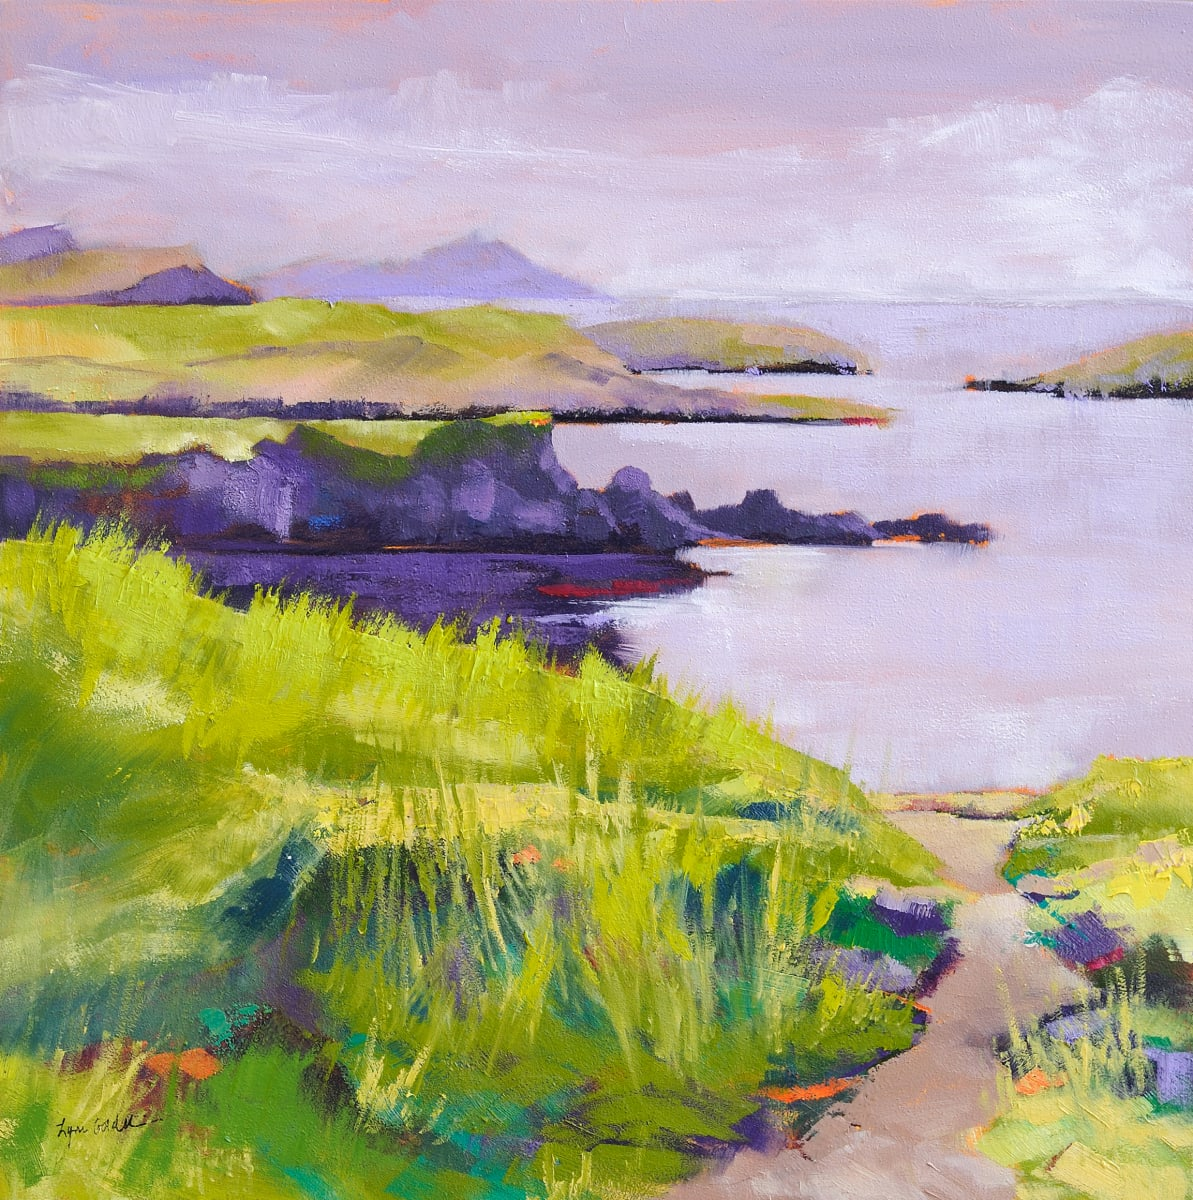 A Spur of Land by Lynn Goldstein